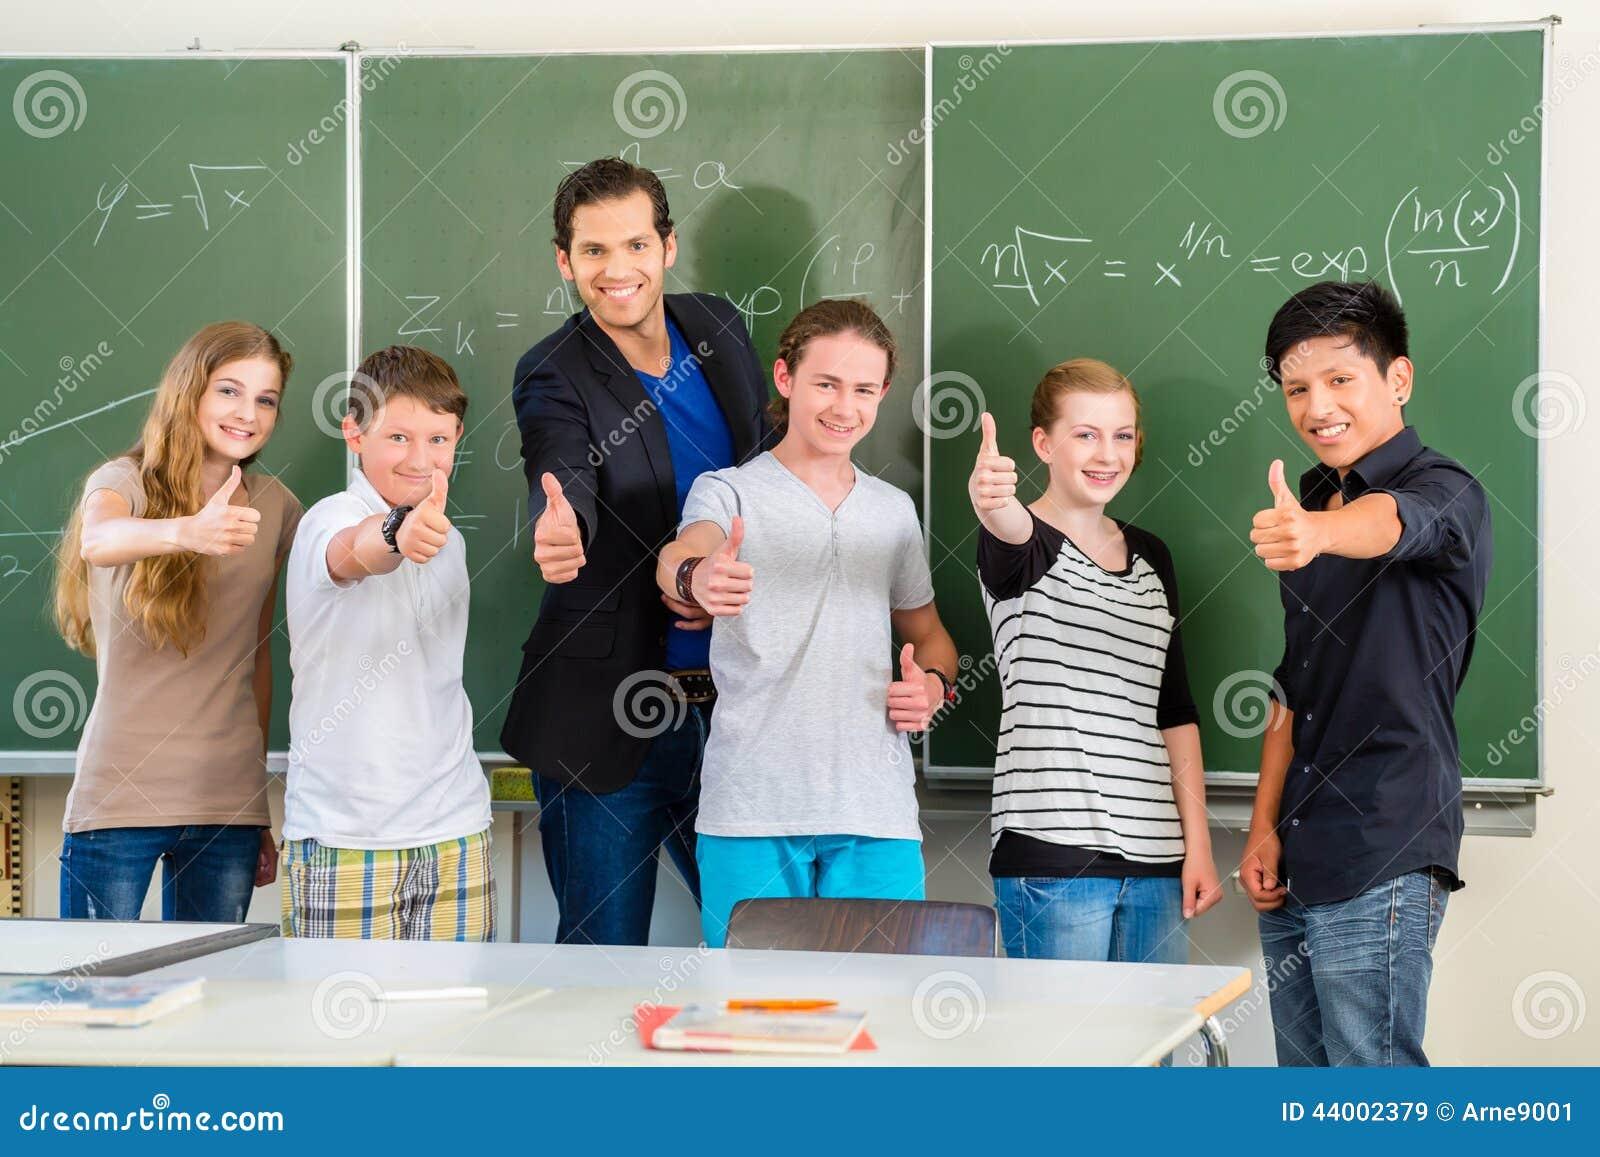 Teacher motivating students in school class